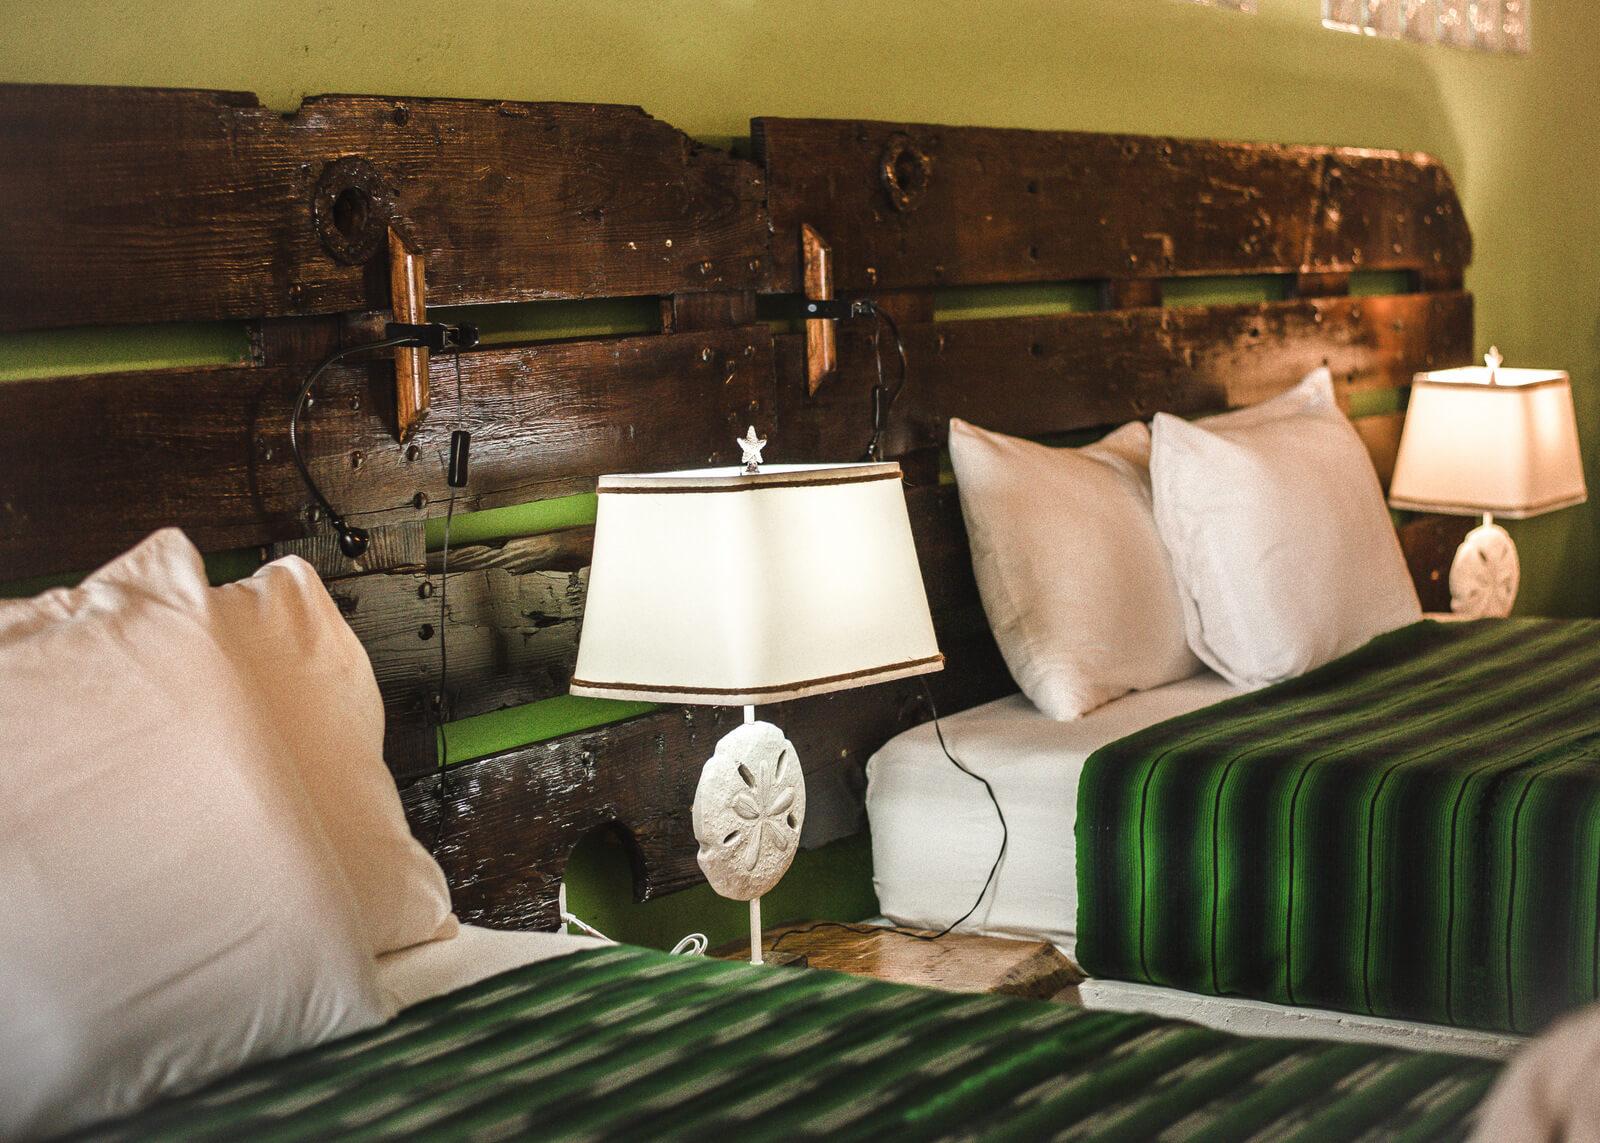 gecko-tranquilseas-hotel